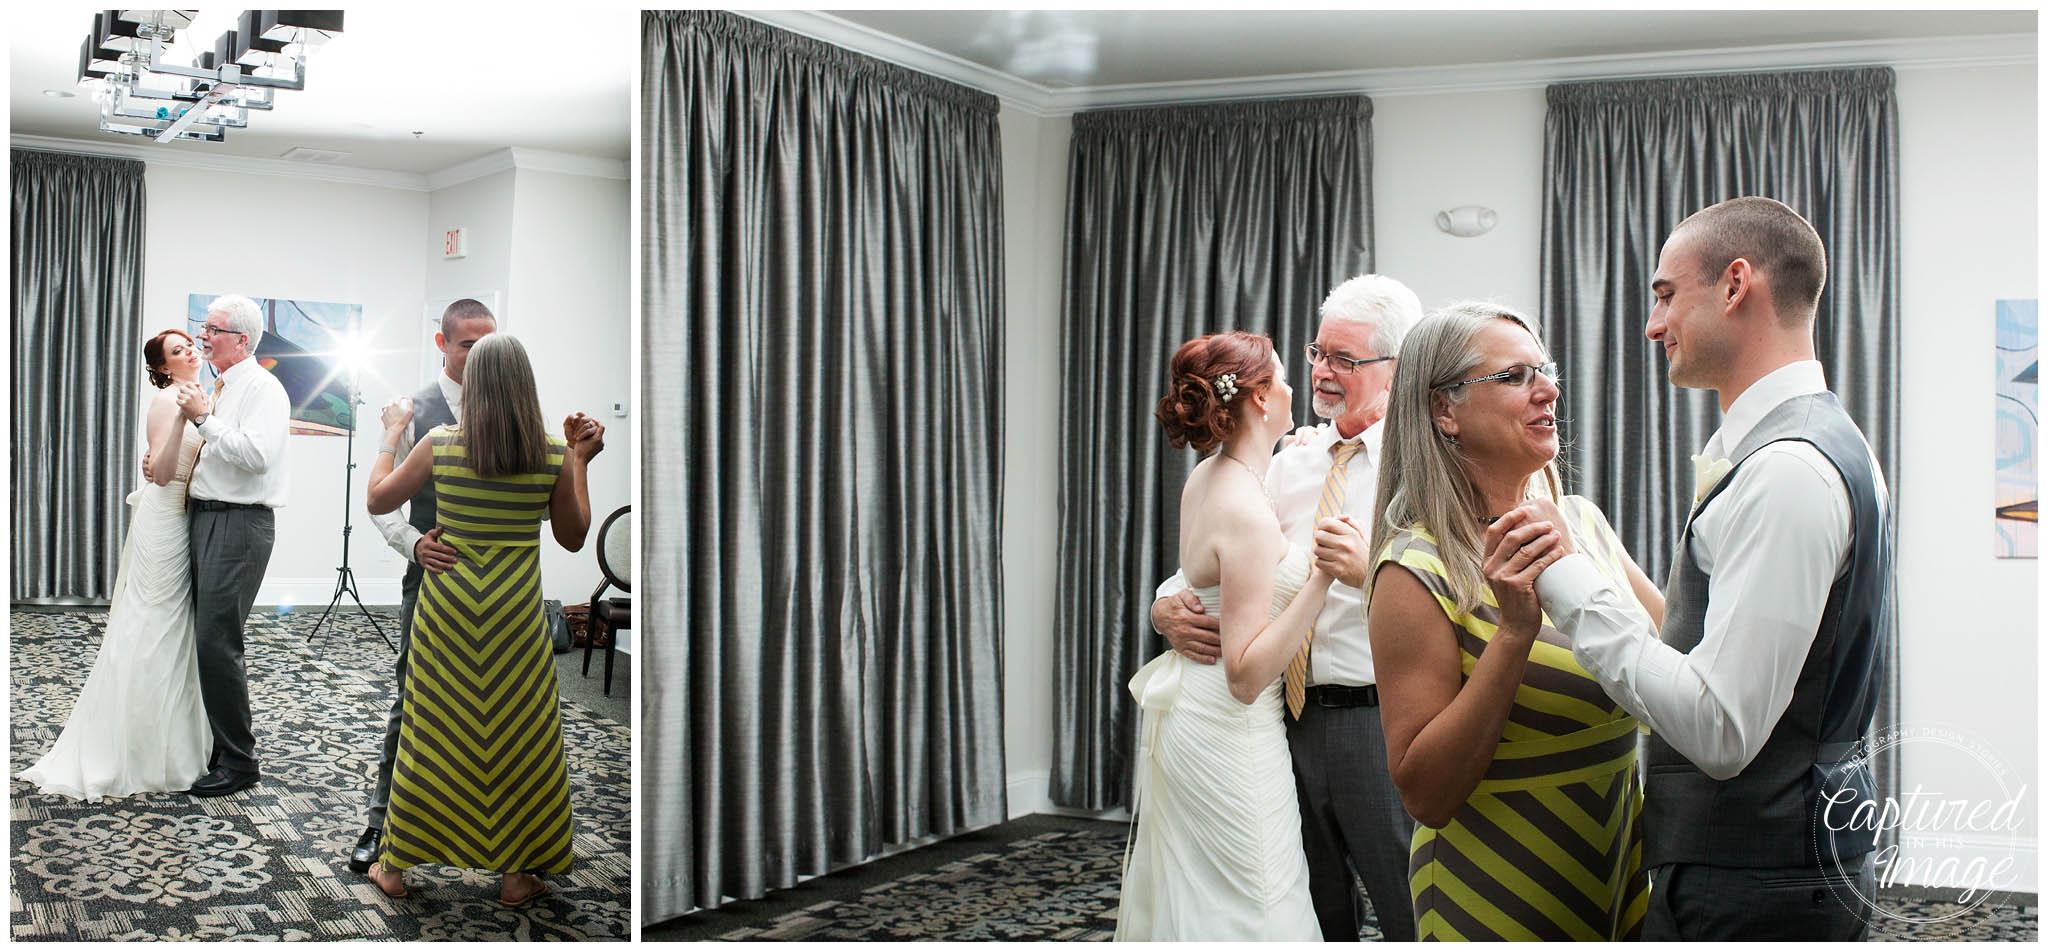 St. Pete Beach Destination Wedding (71 of 81)